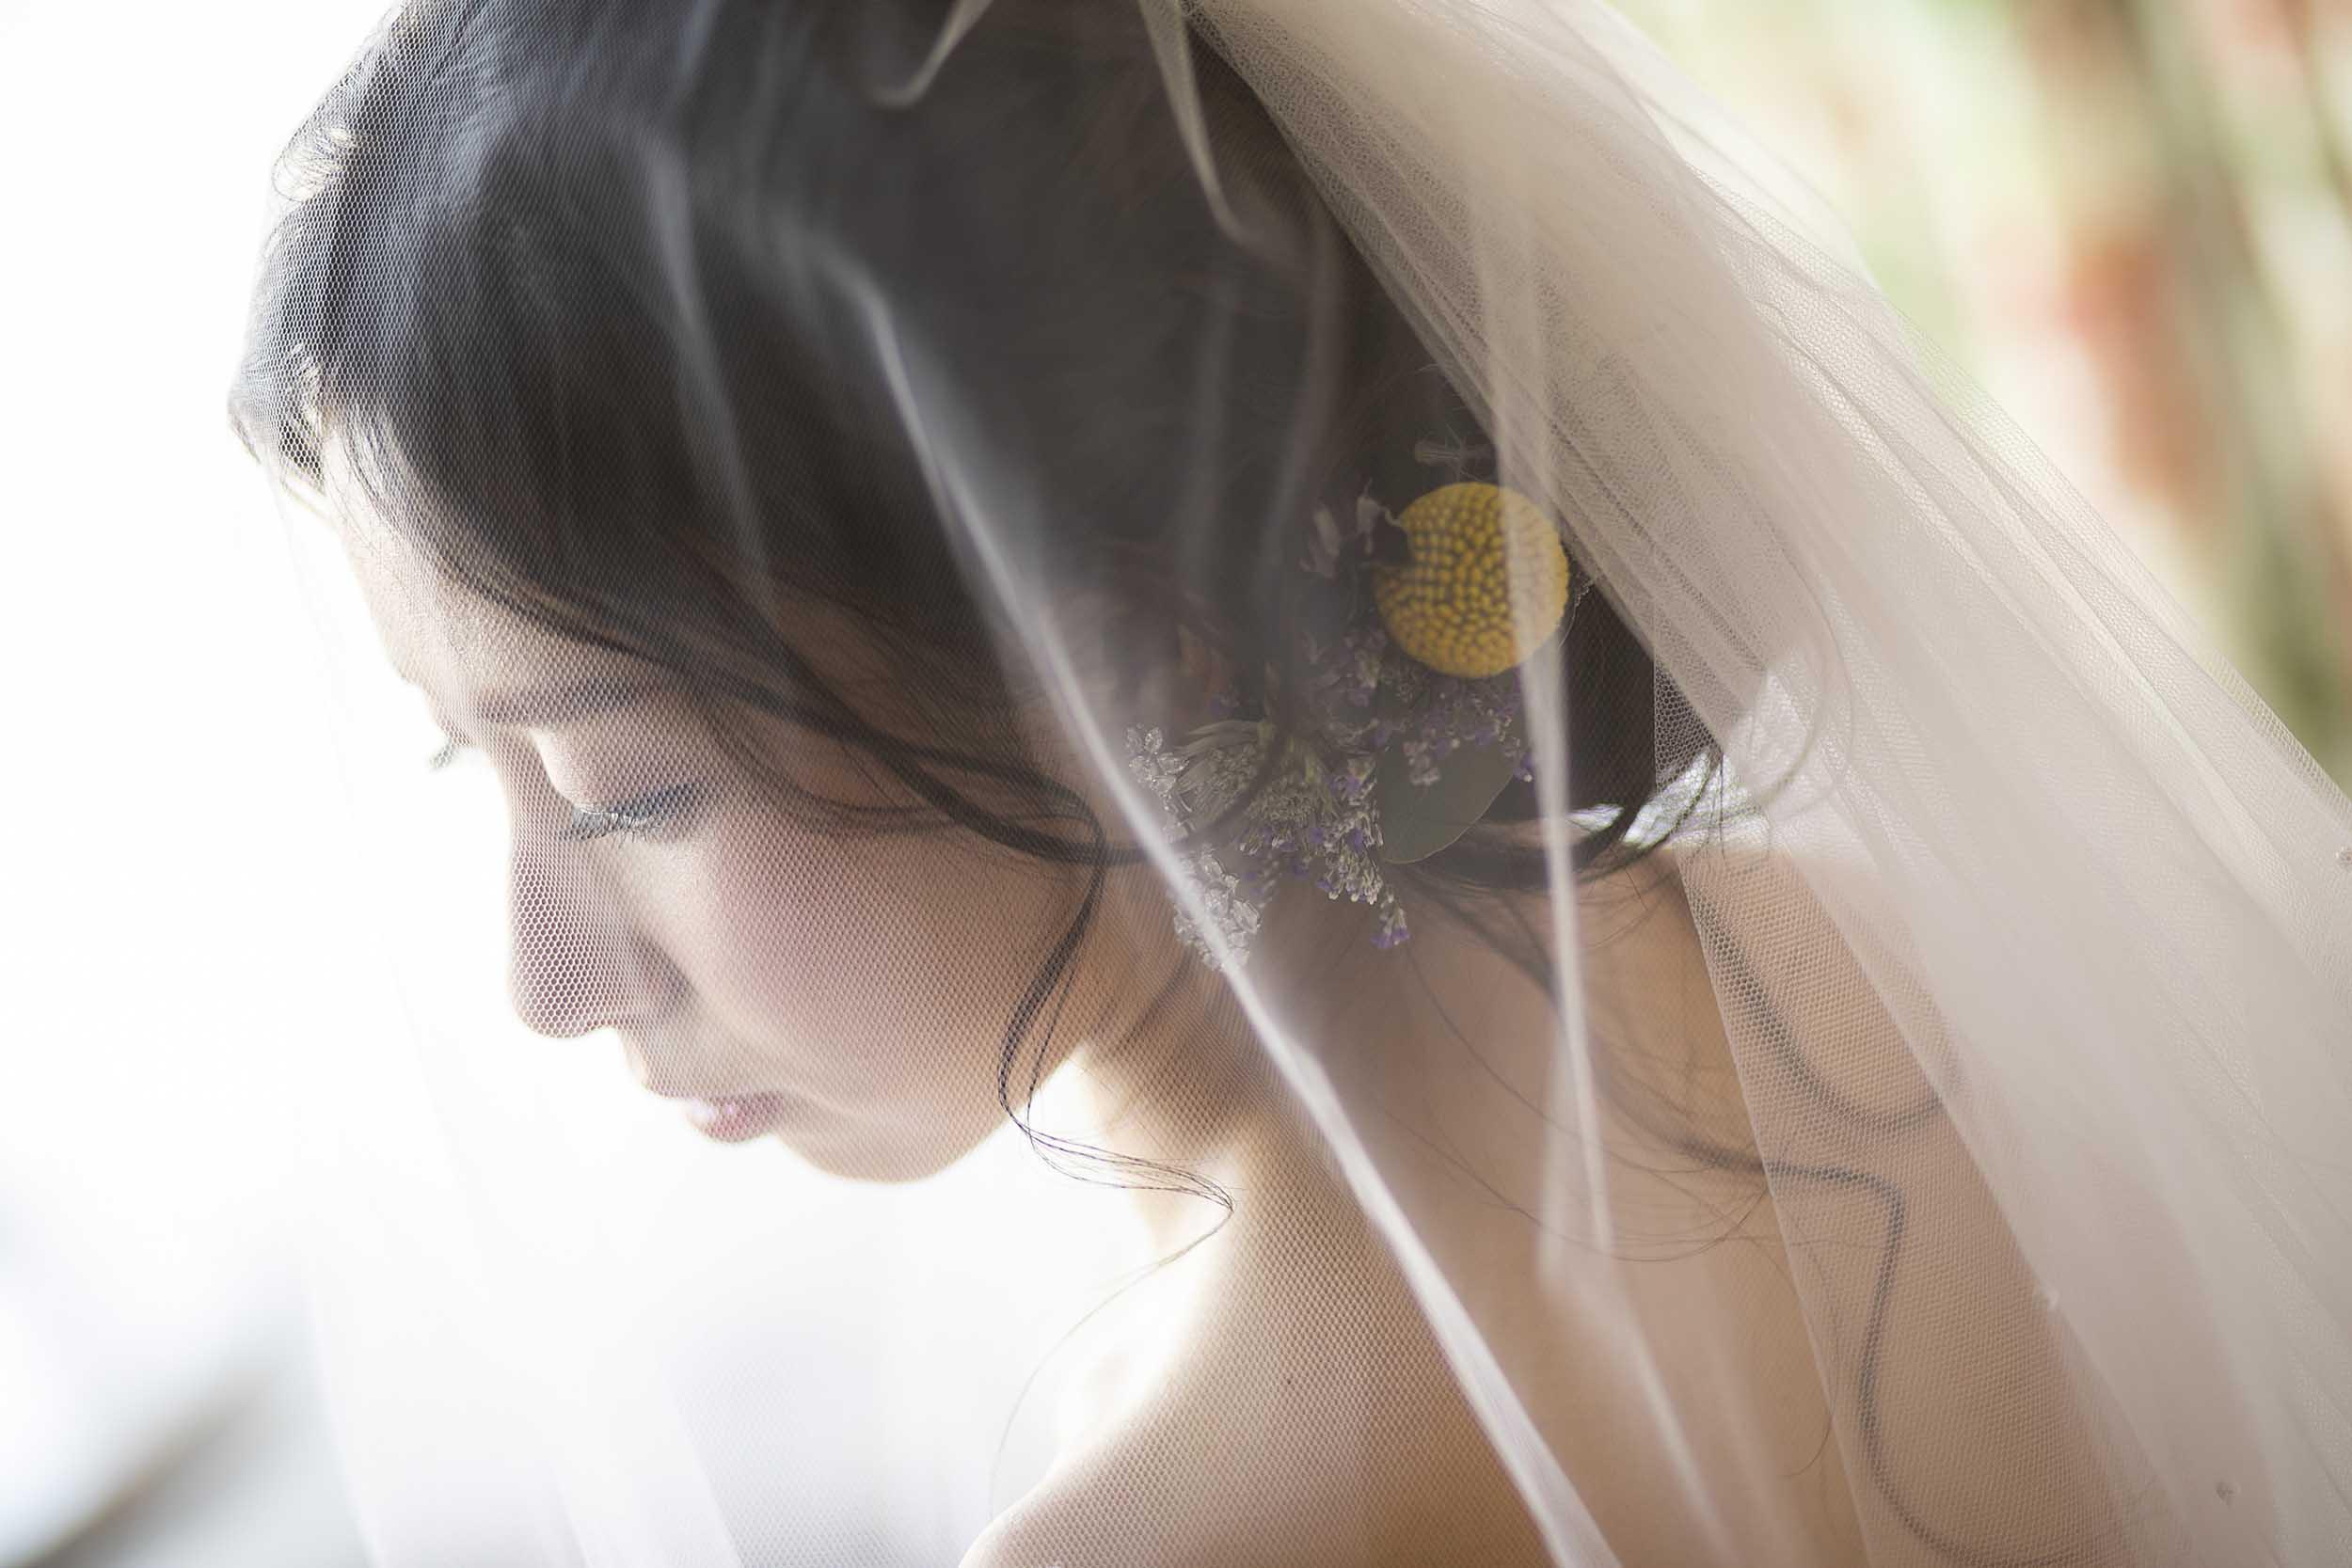 ppp_nakashima_select_0011